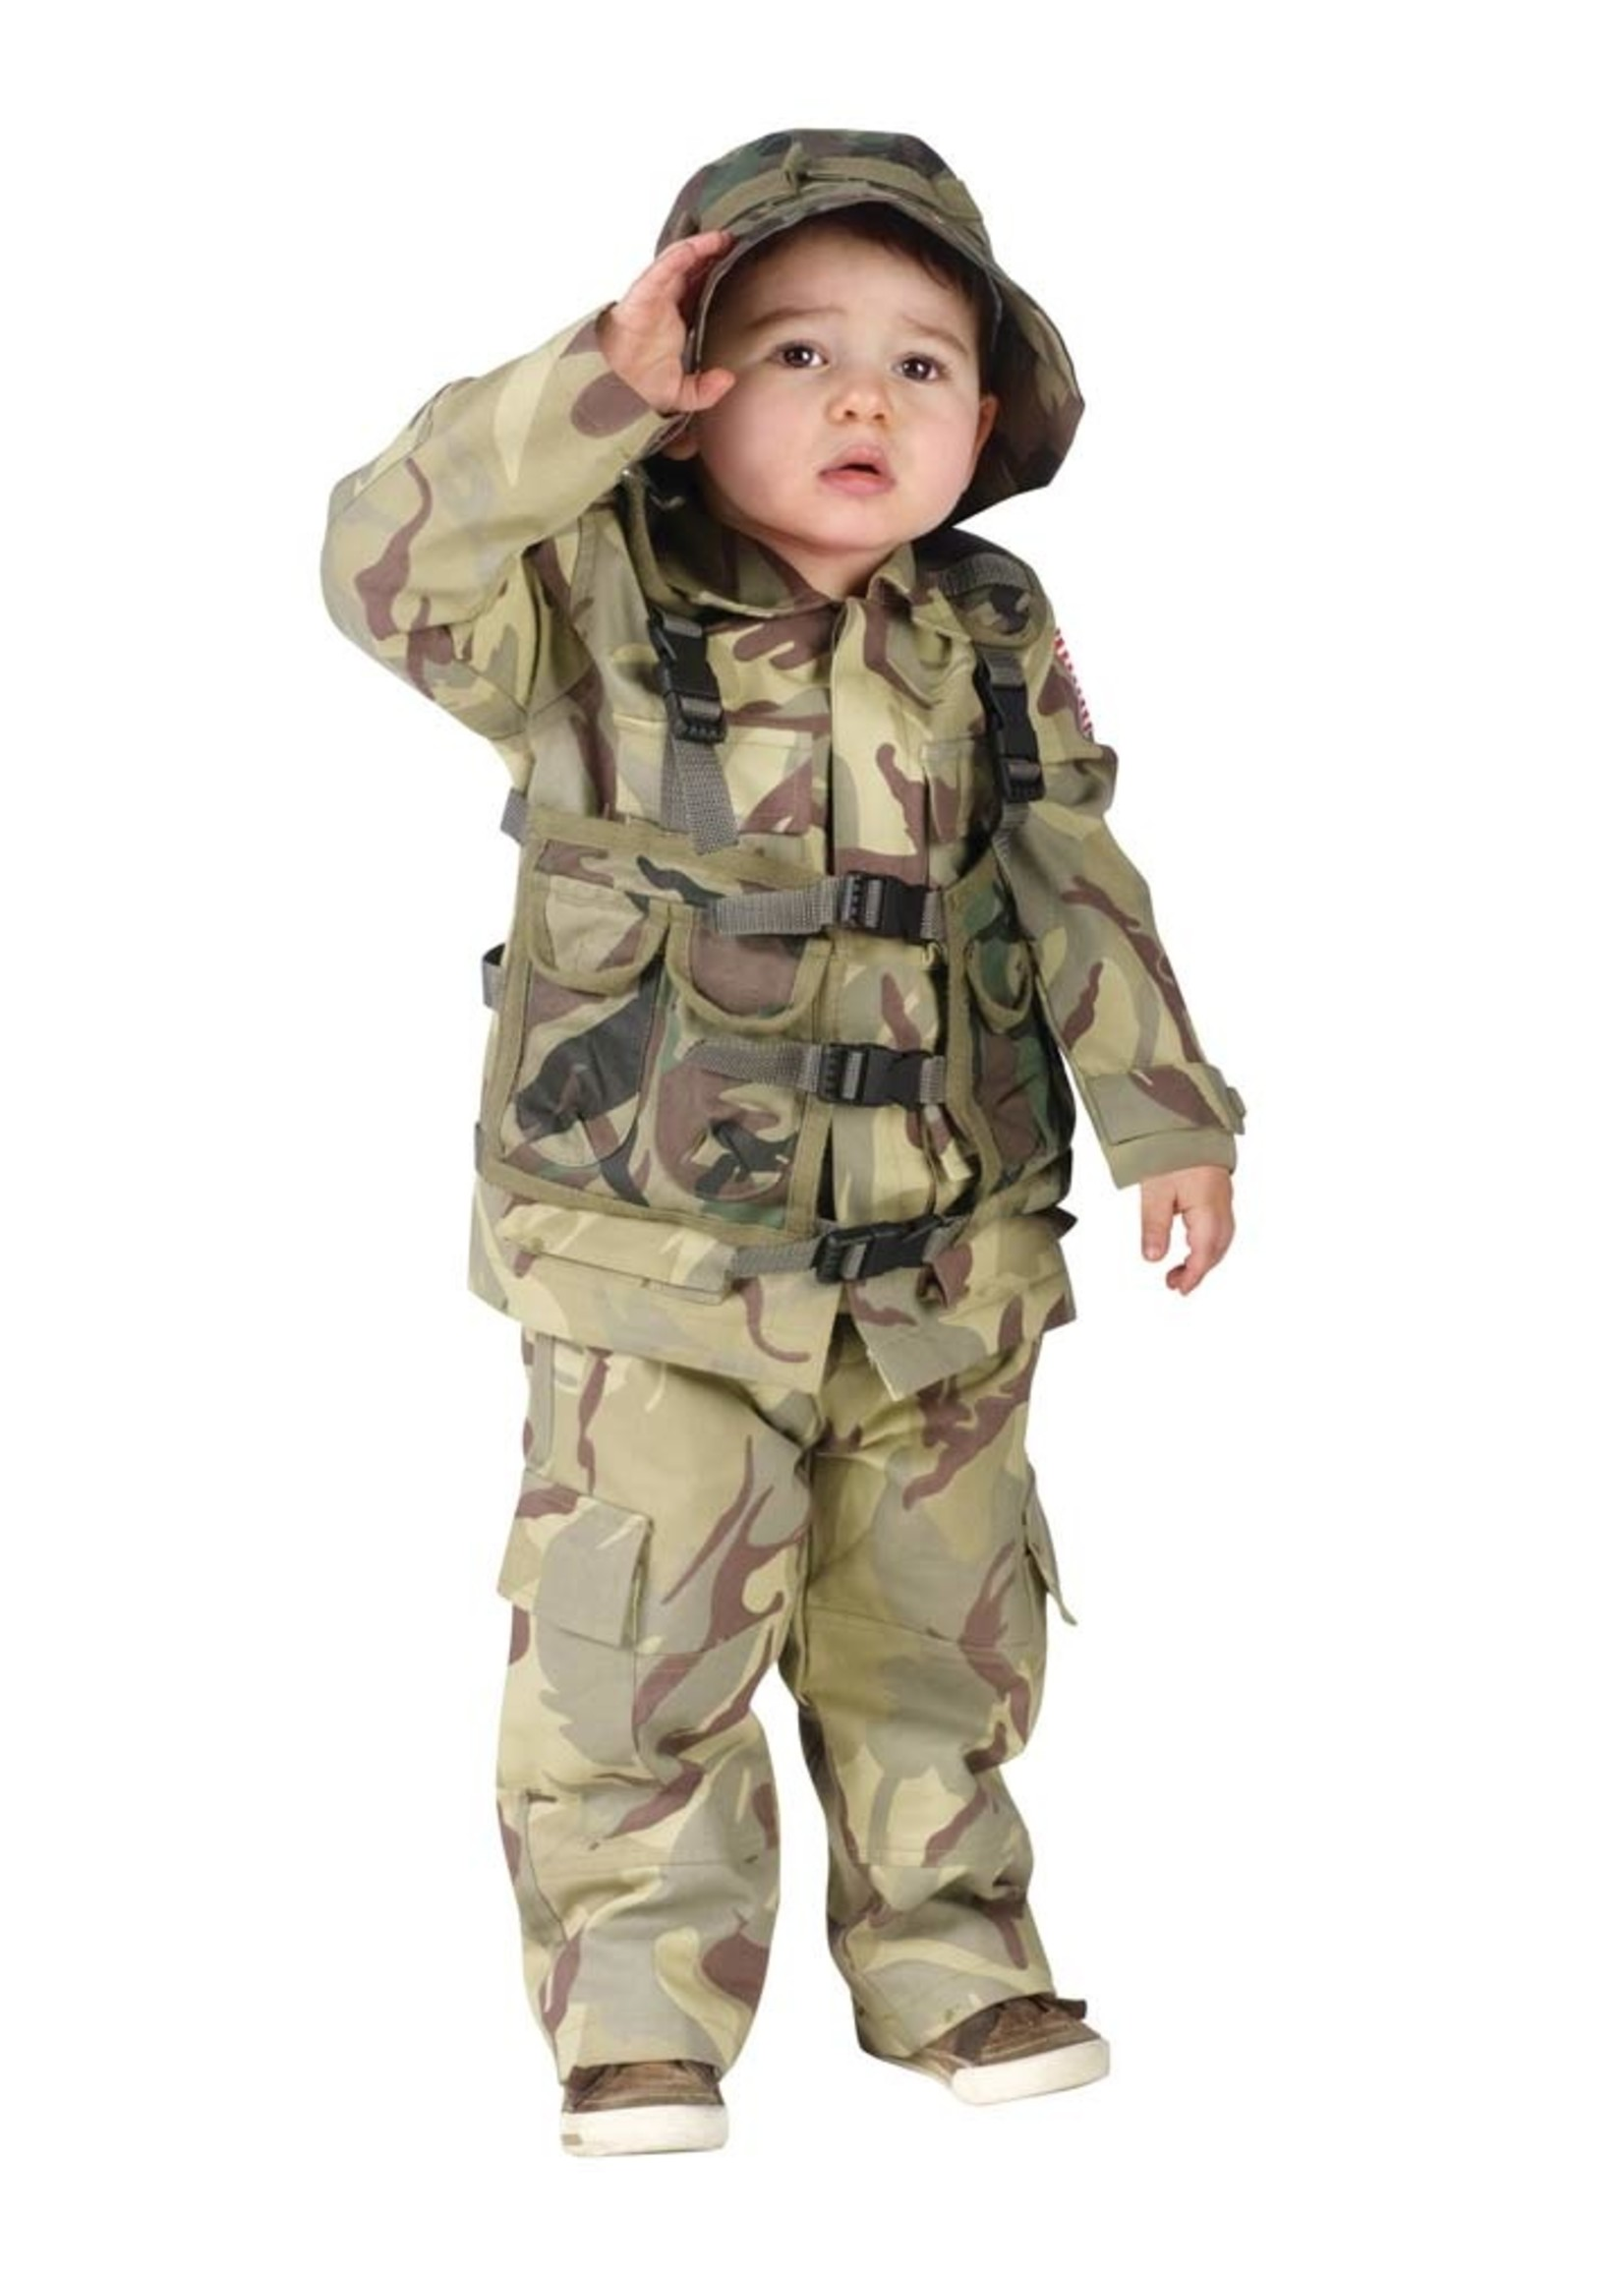 FUN WORLD Delta Force - Toddler